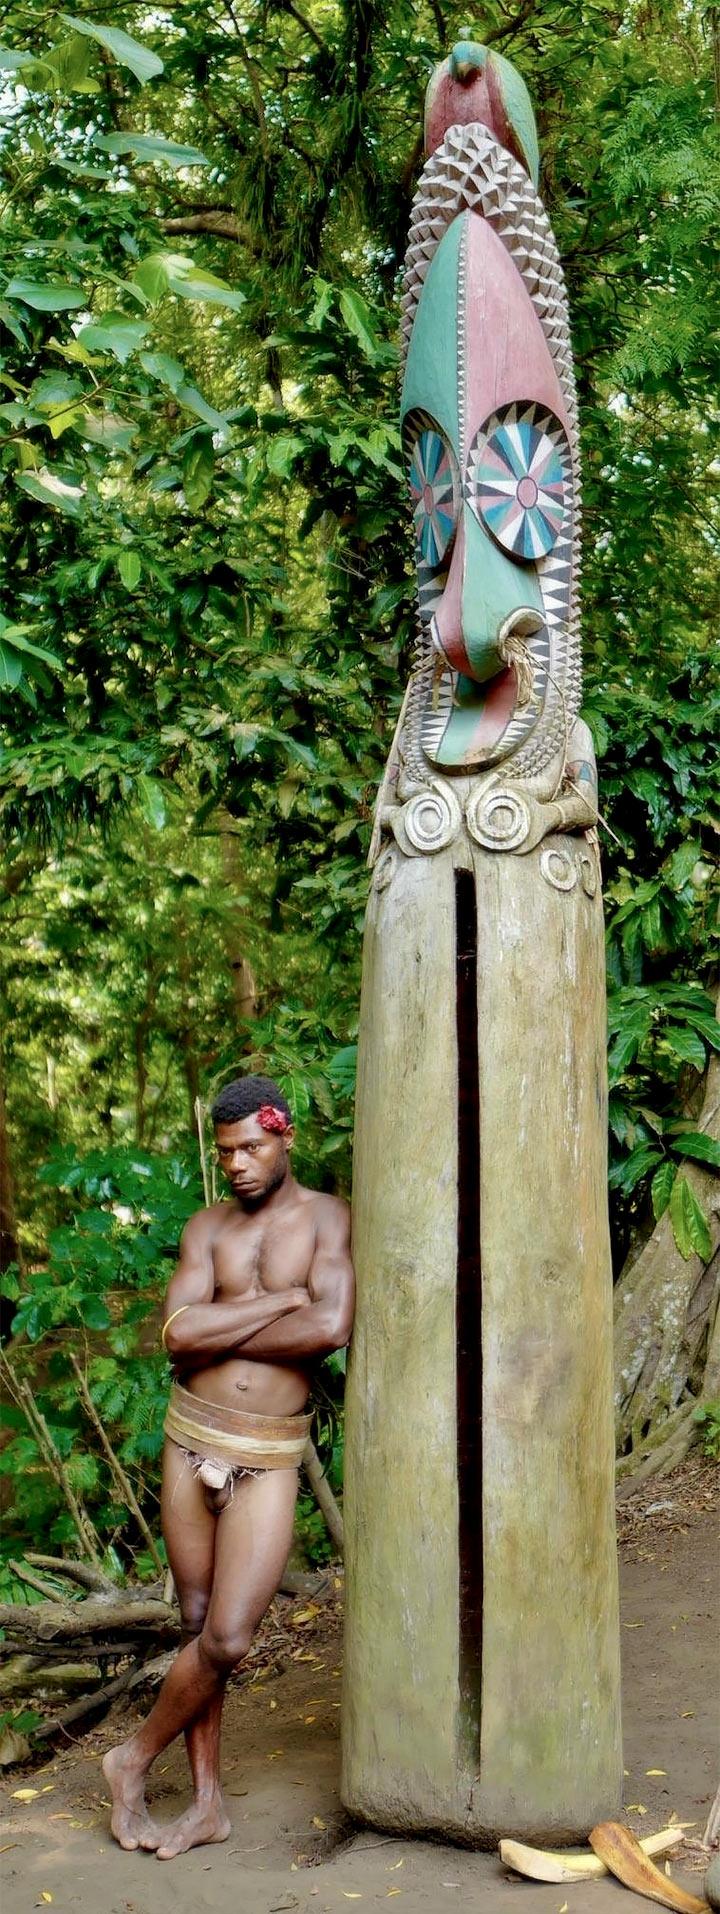 Vanuatu cultural tribal totem pole sculpture via superyacht.